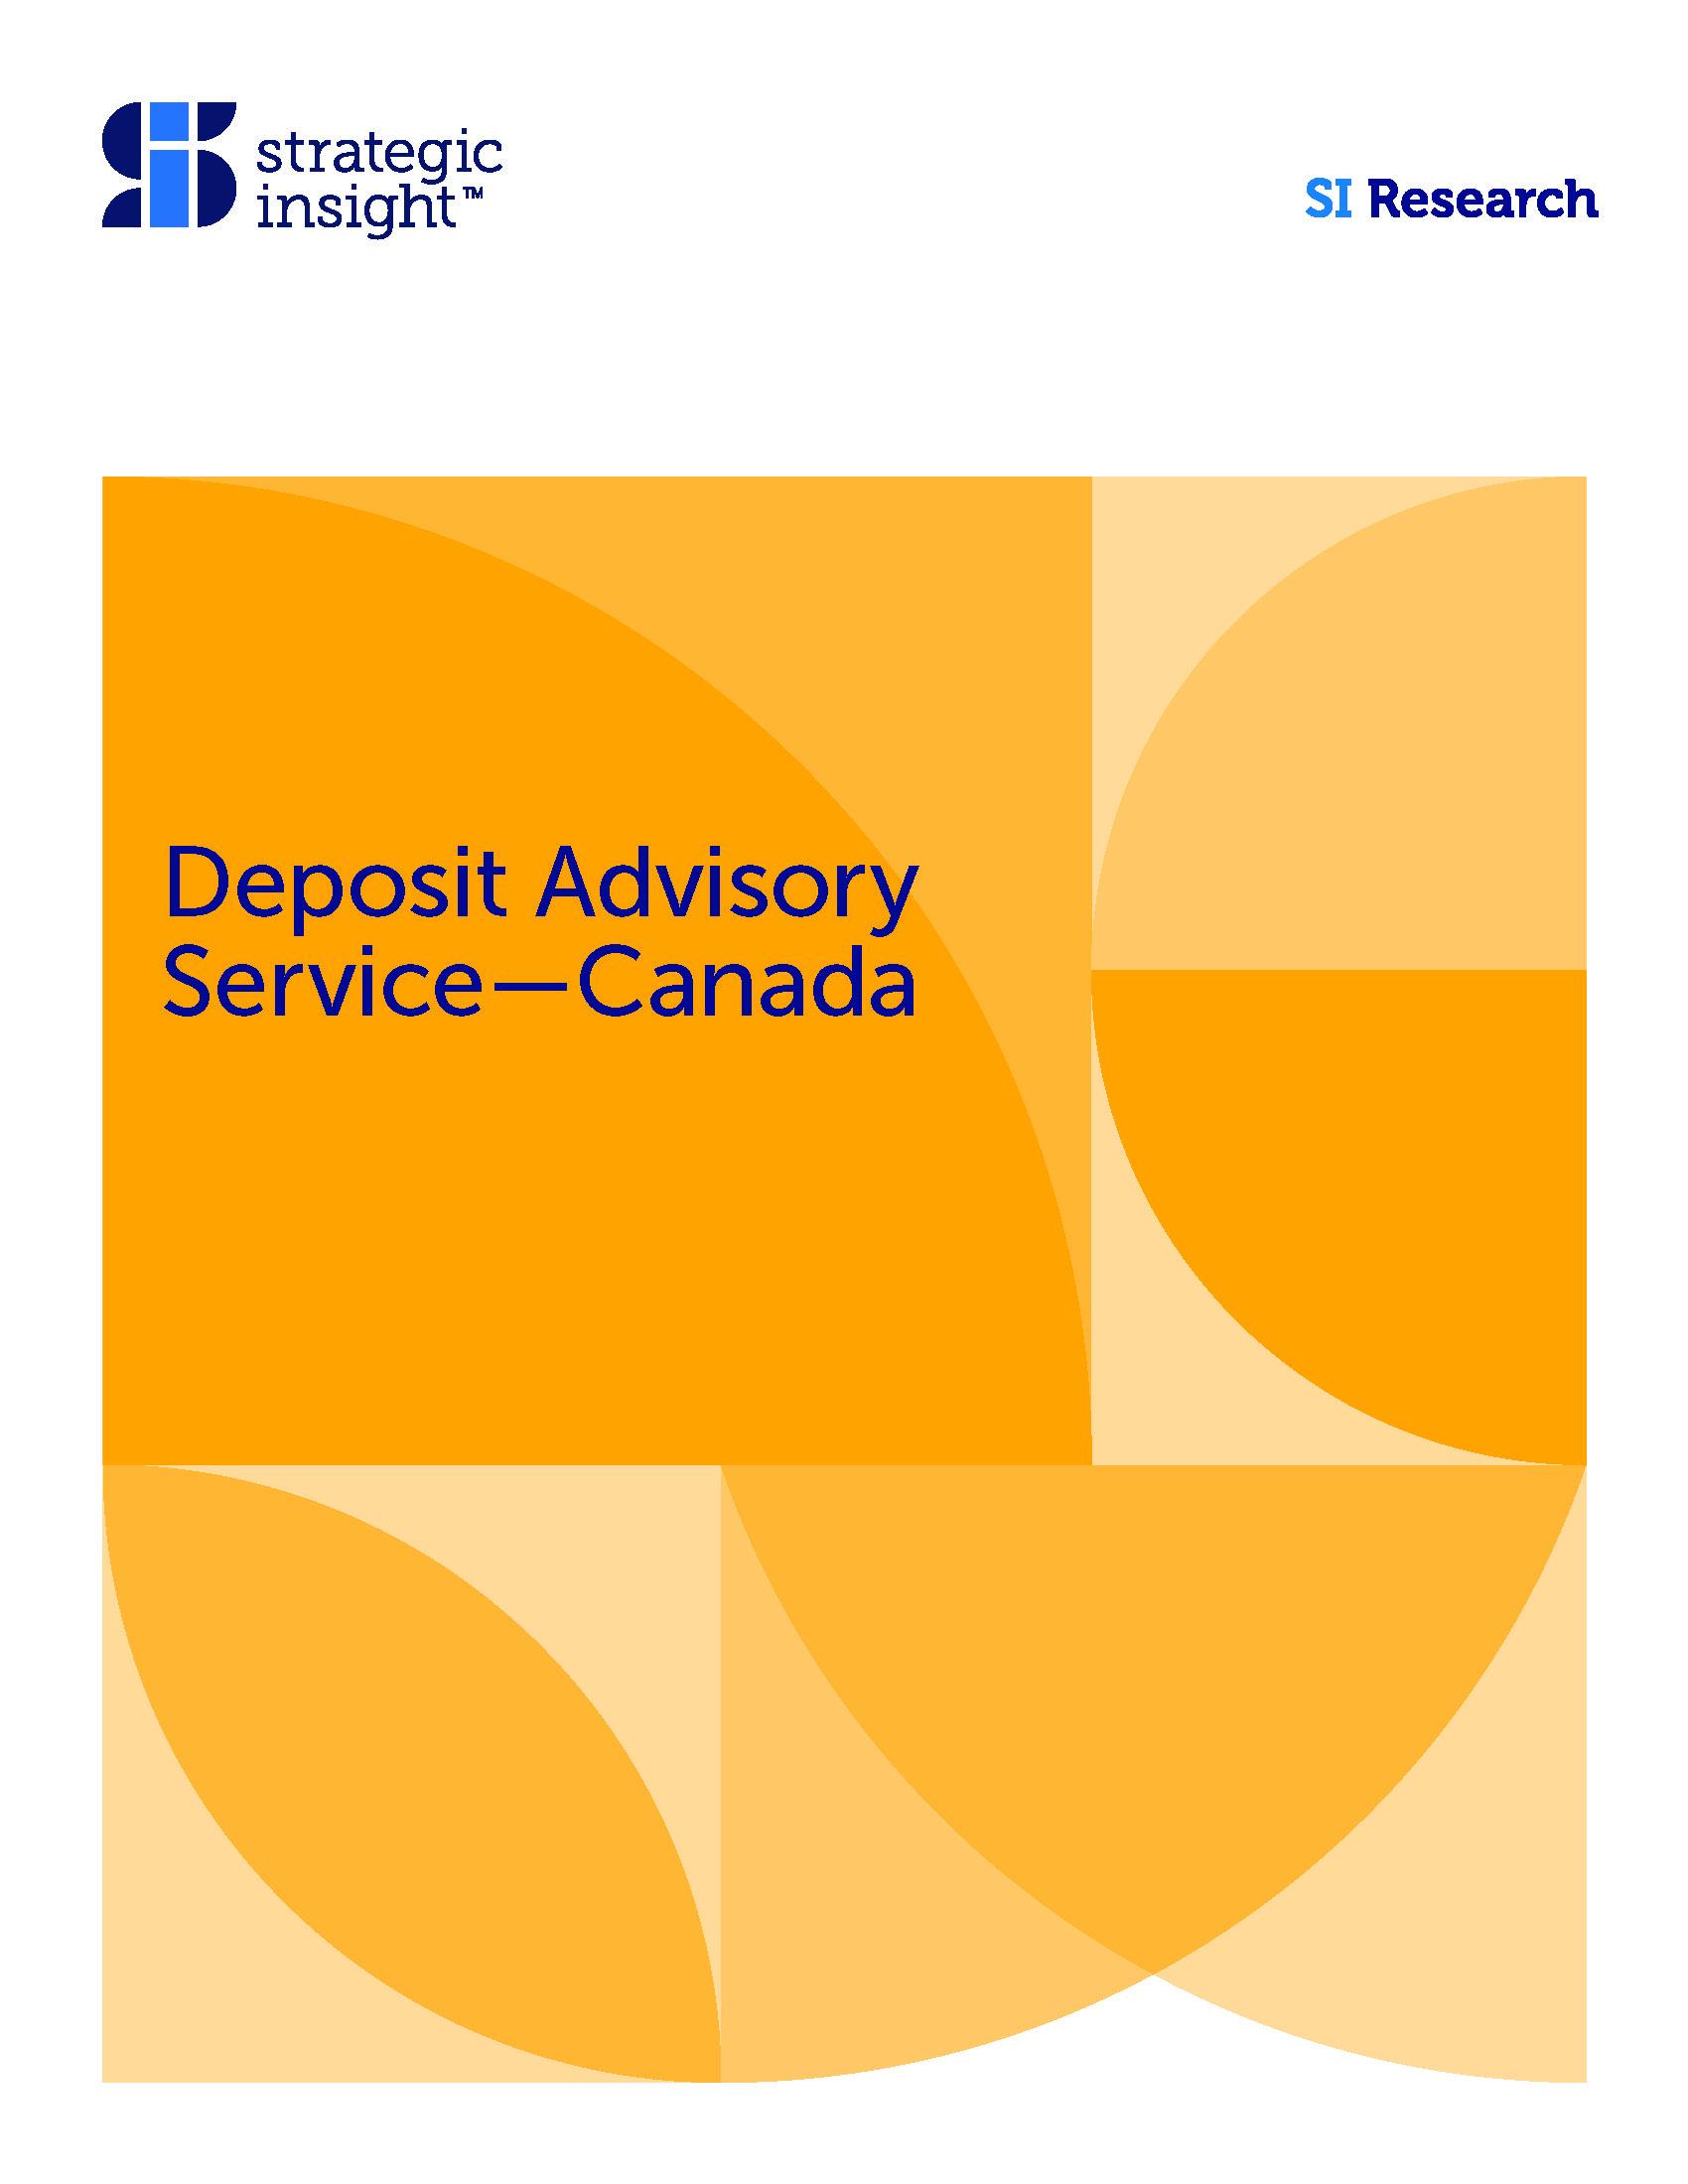 Deposit Advisory Service Spring 2019